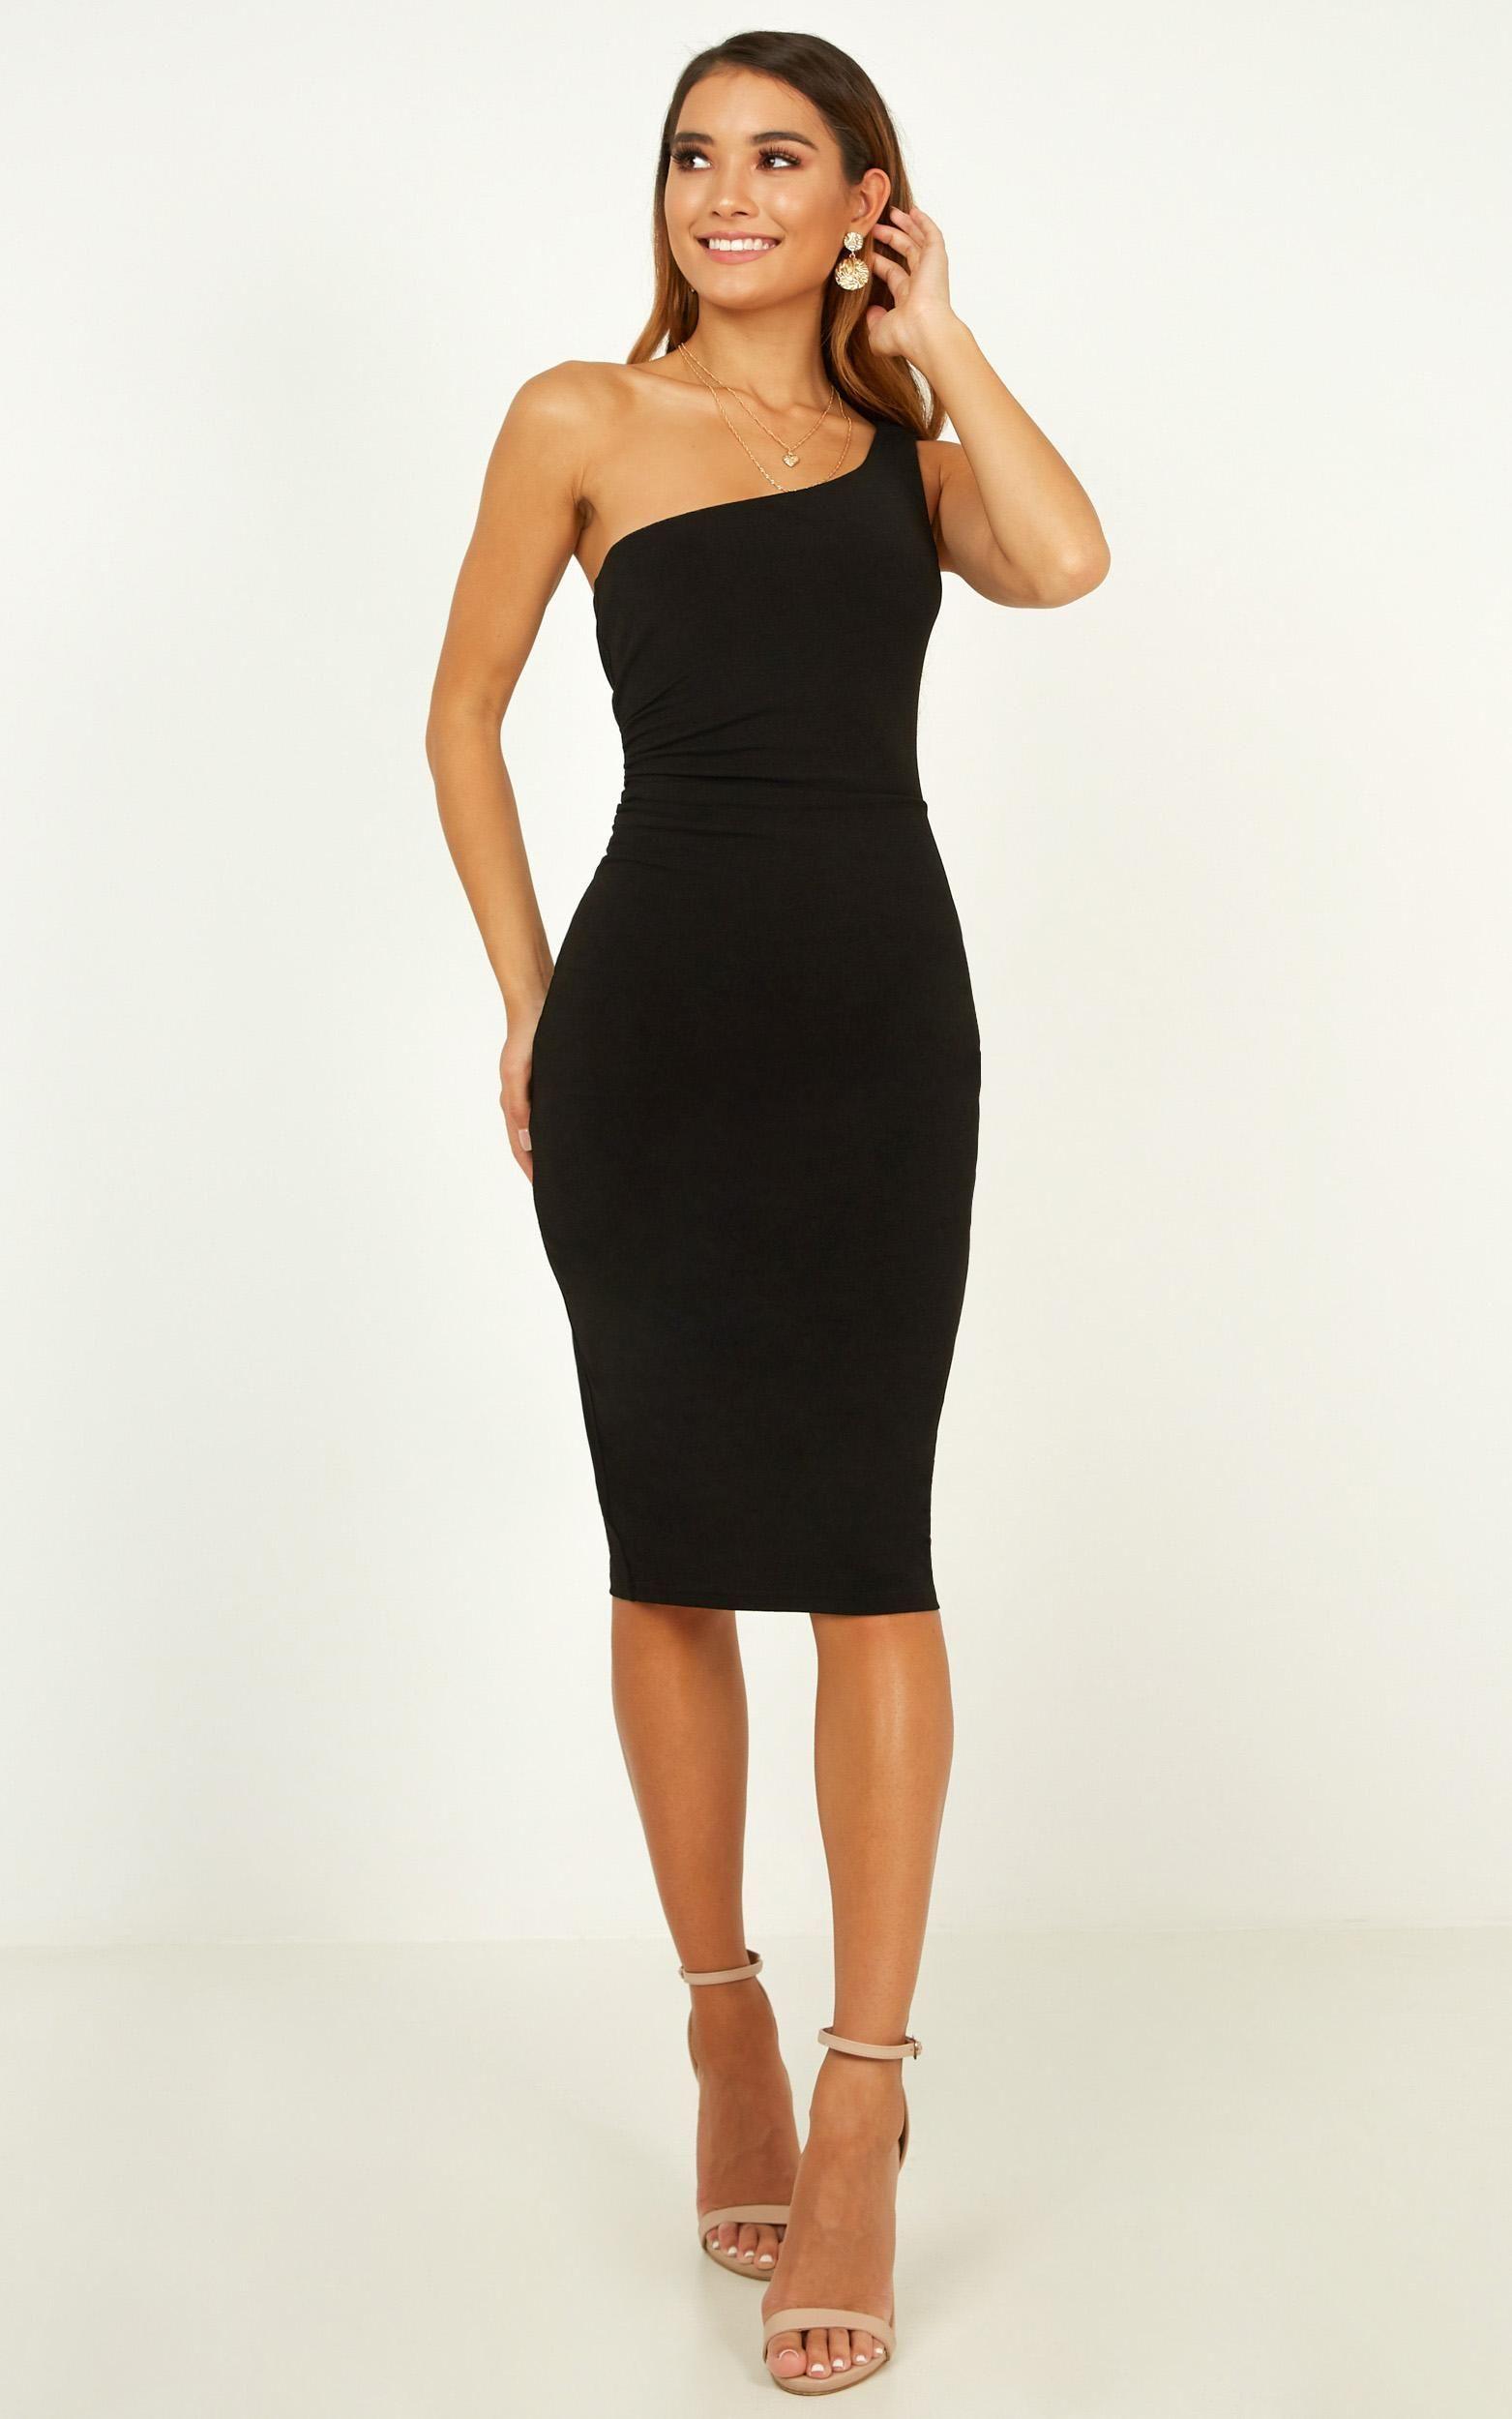 Got Me Looking Dress In Black Showpo Cocktaildressesonline Black Dress Classy Dress Dresses [ 2500 x 1563 Pixel ]